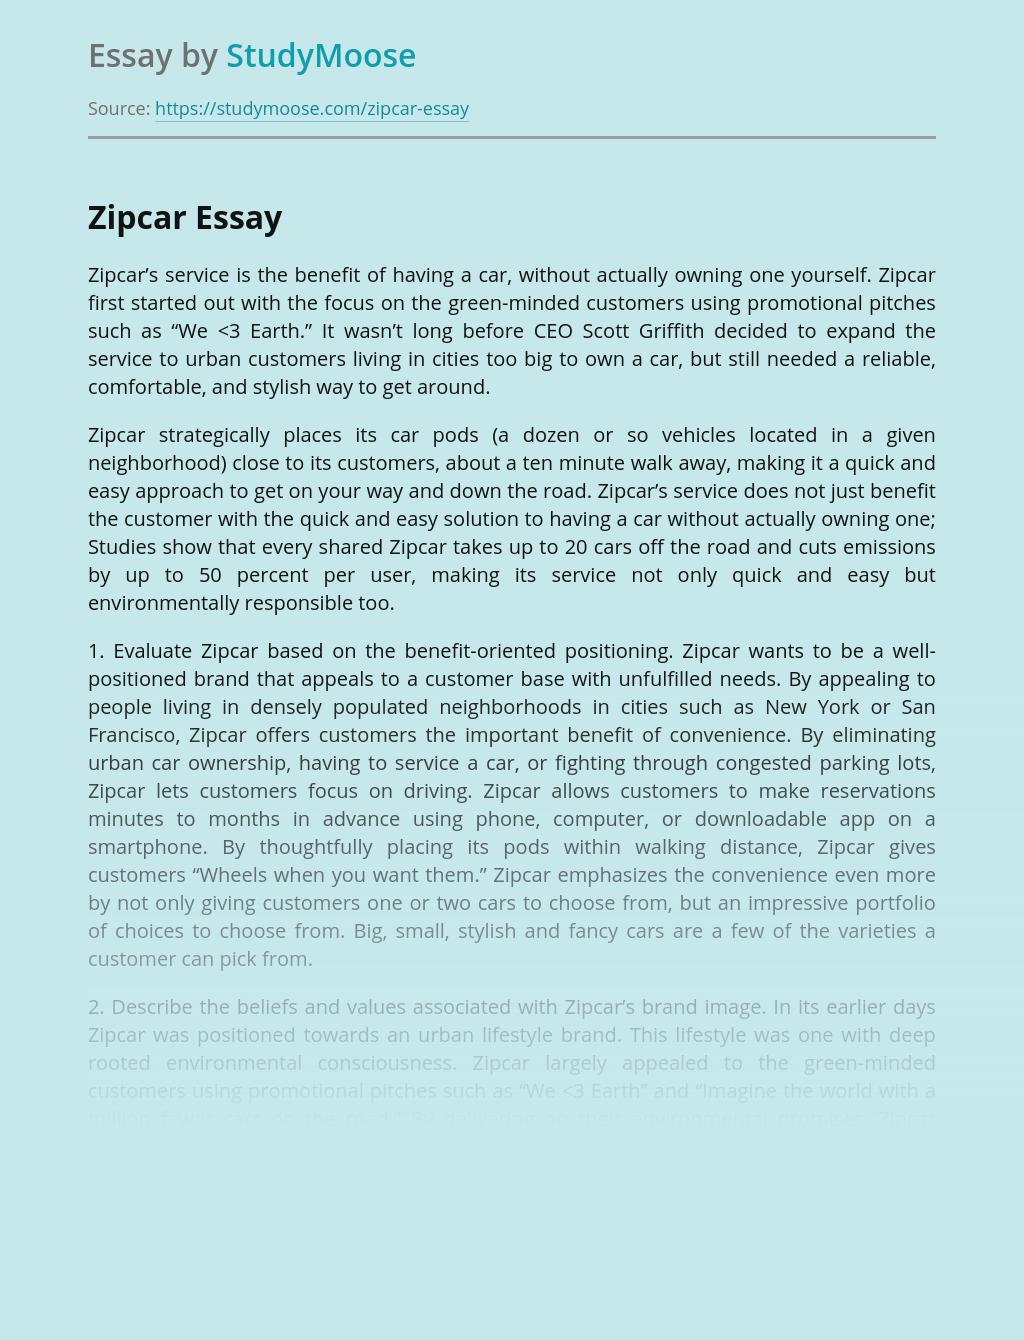 Environmental Awareness of Zipcar Company